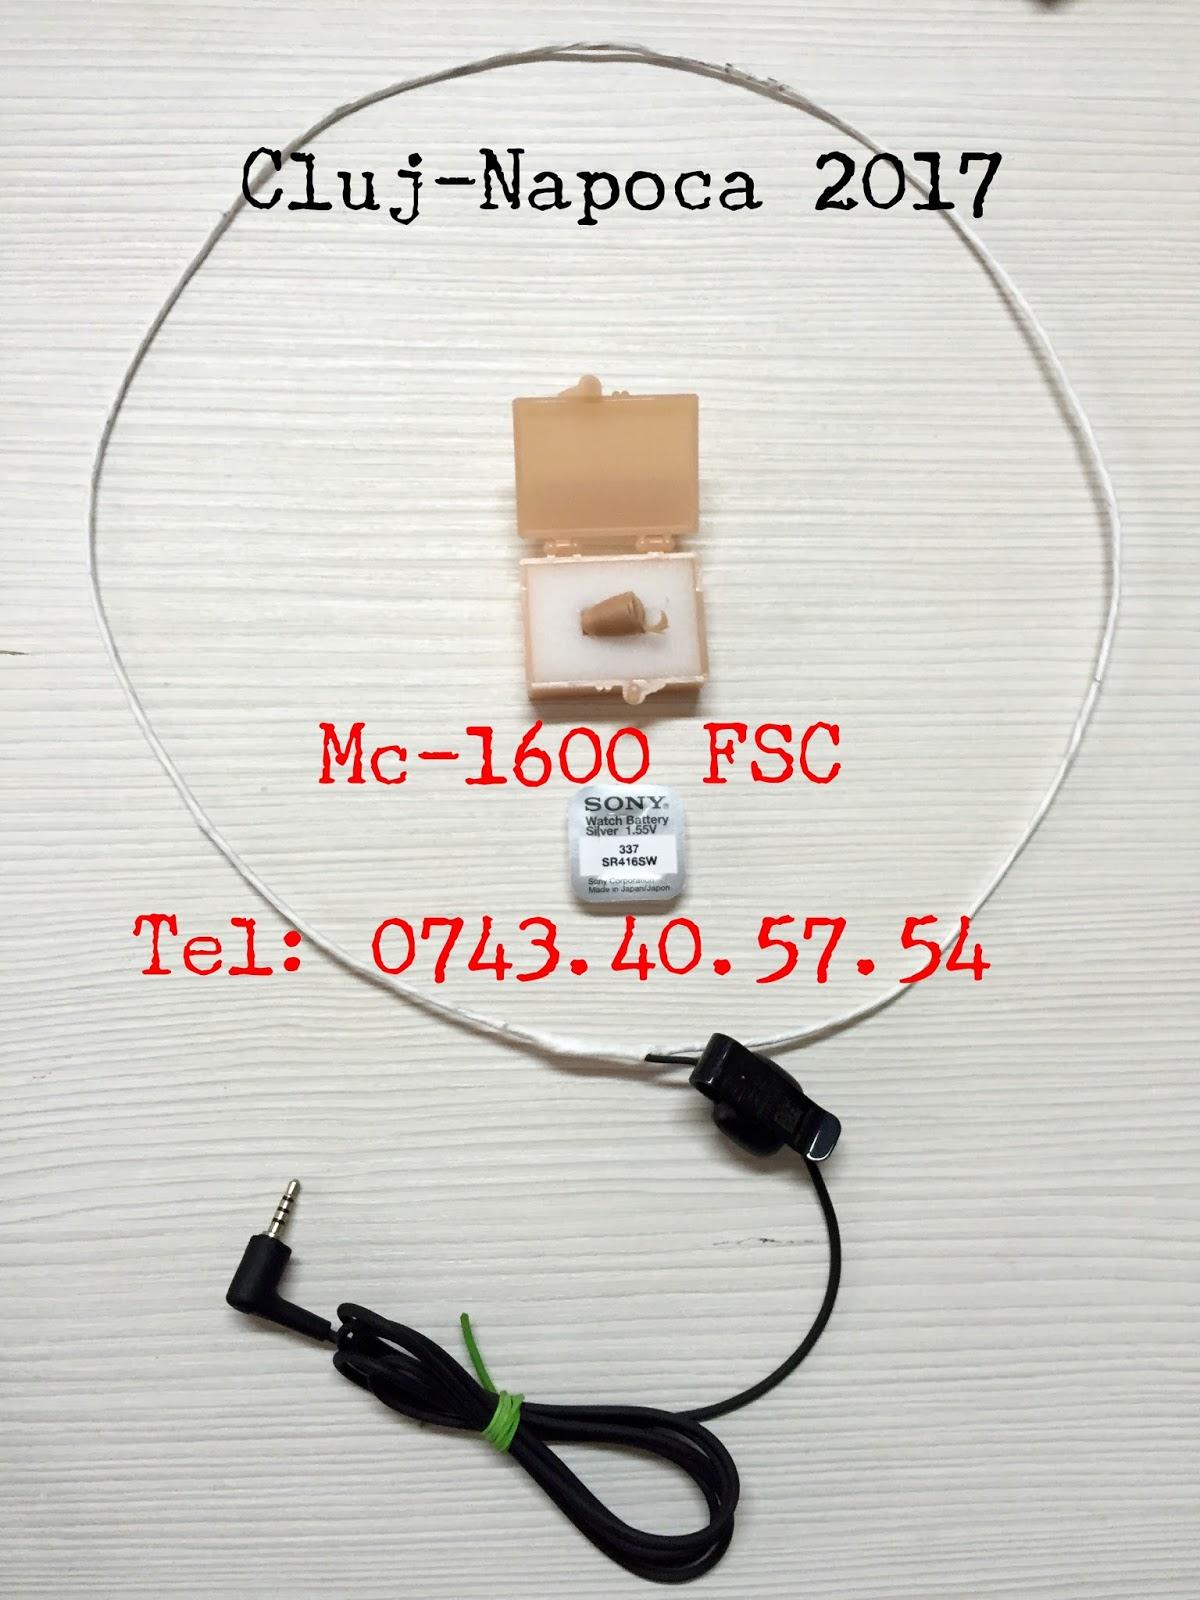 hight resolution of sistem colier casca japoneza motorola mc 1600 fsc mc 1700 fsc mc2000 actuala denumire nejustificata 1 baterie functioneaza la orice telefon sau